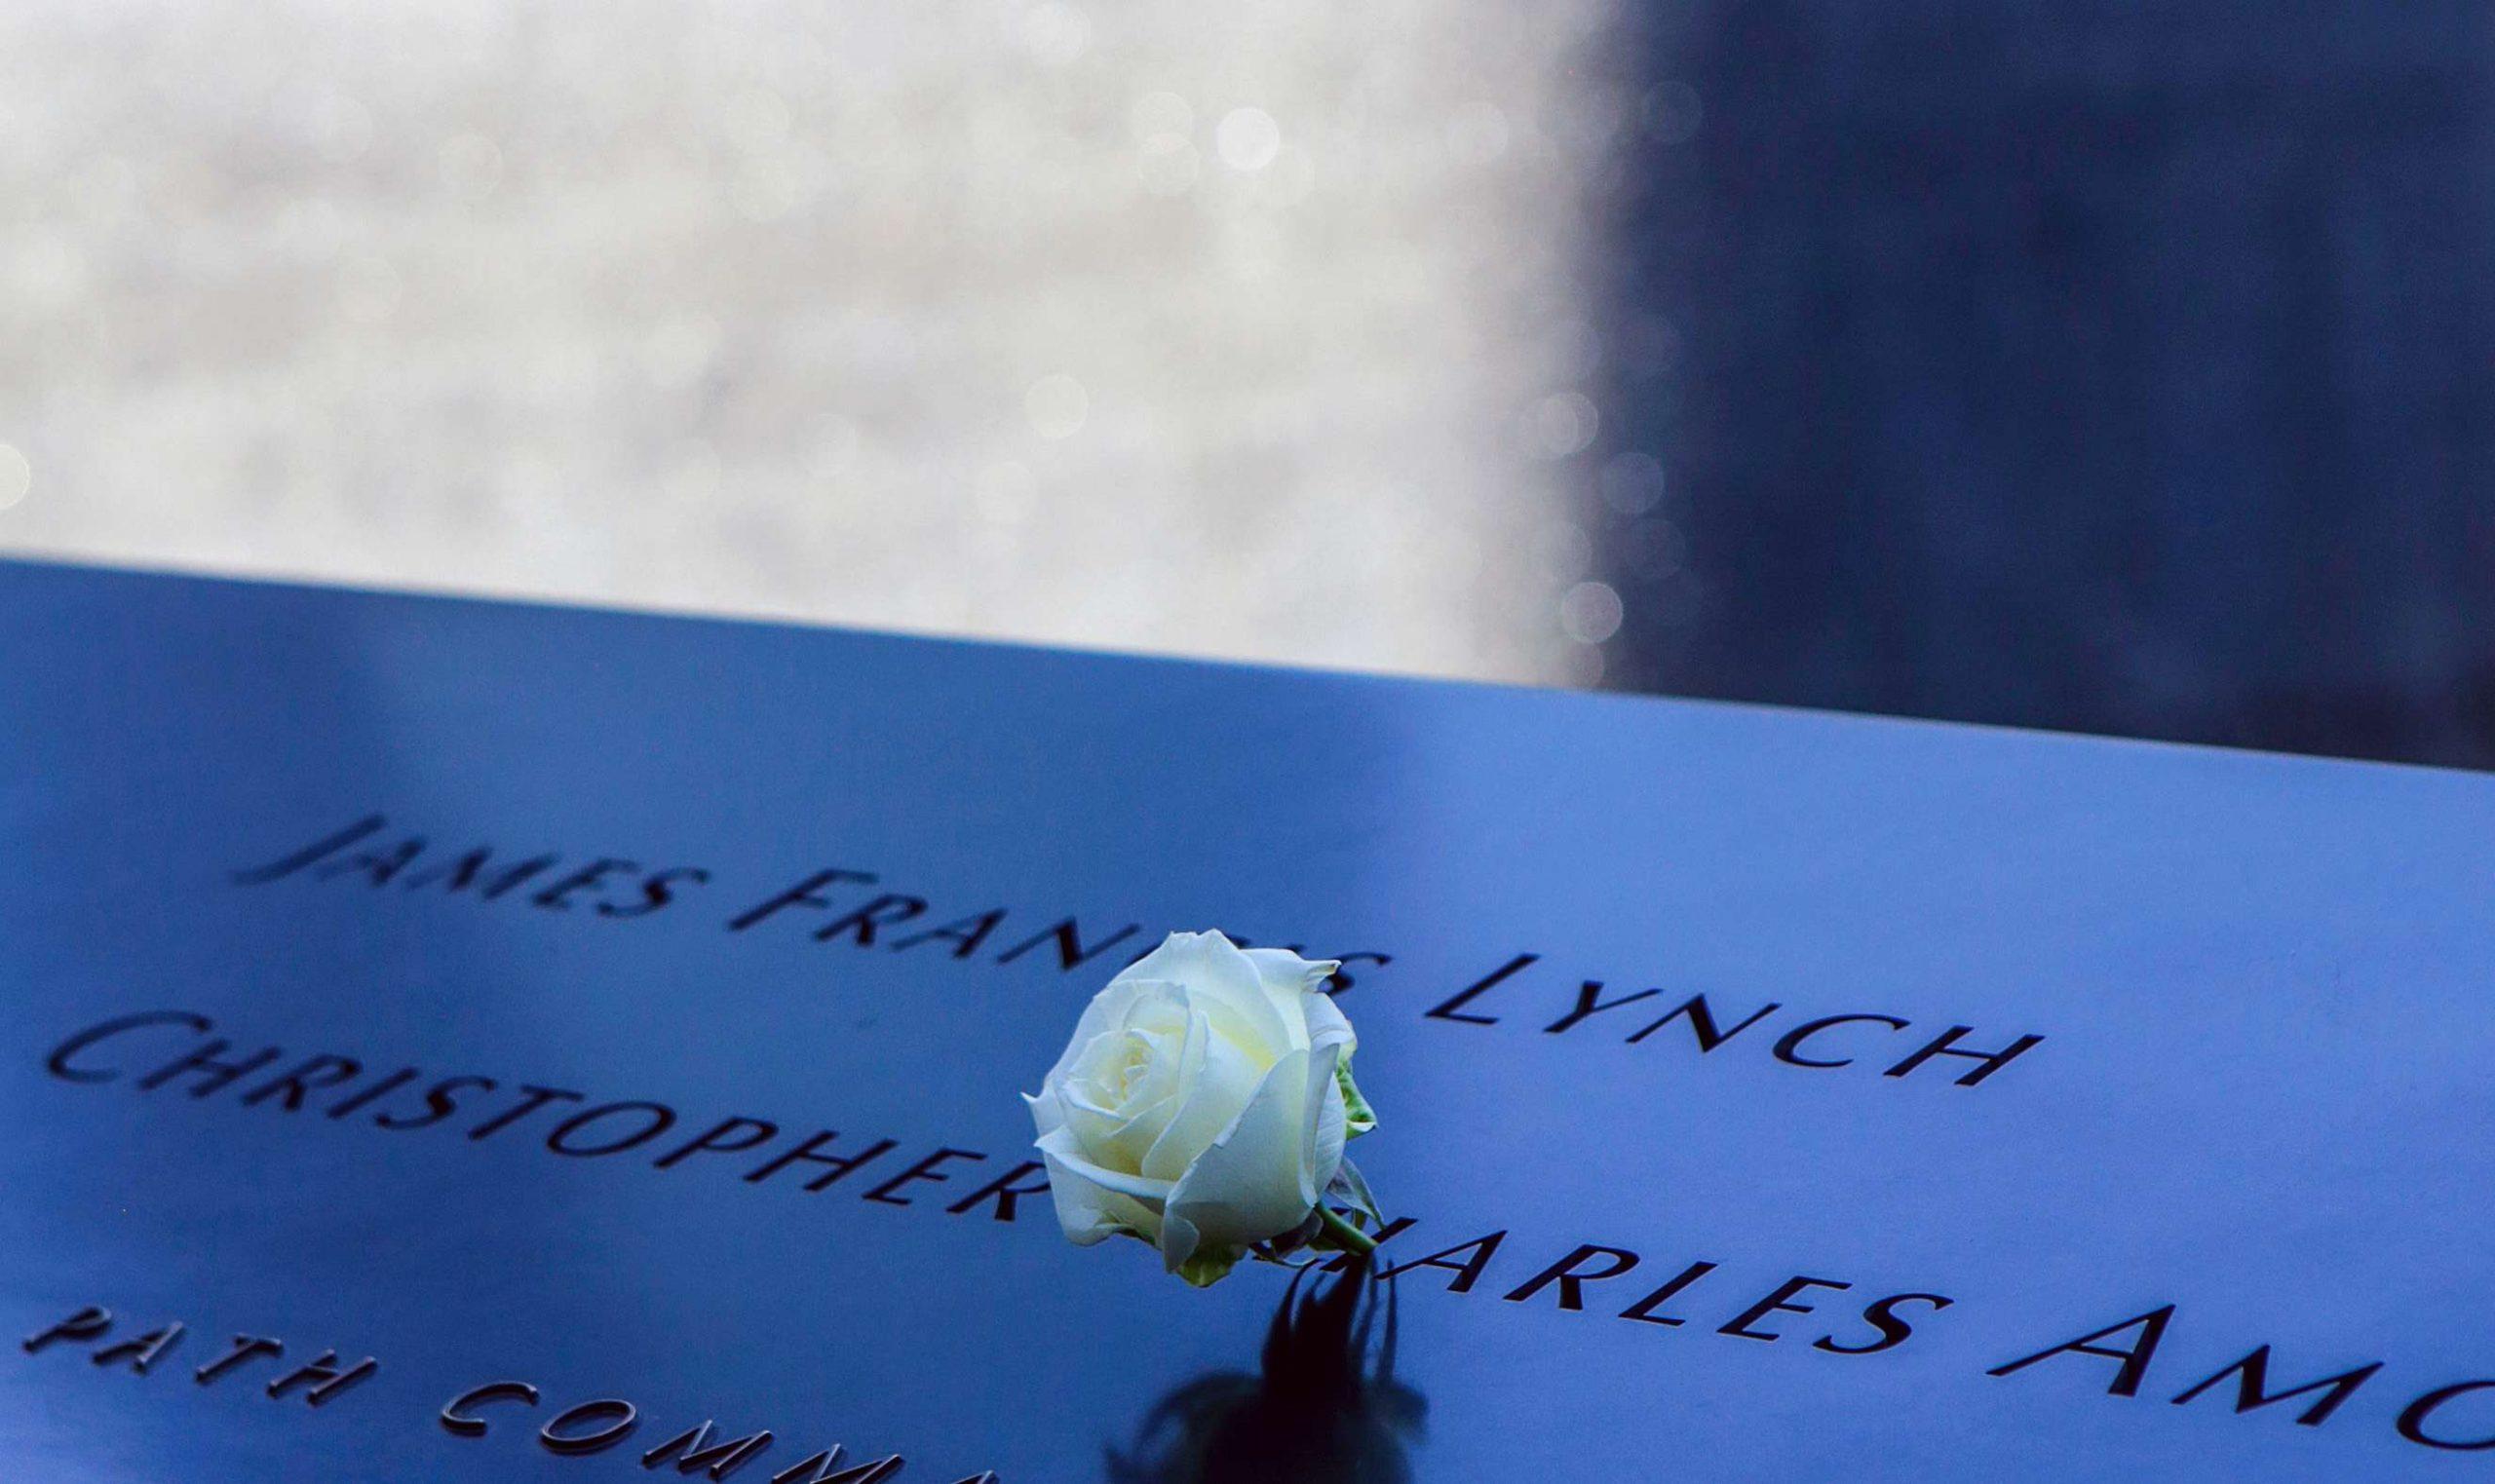 White Roses in 9/11 Memorial